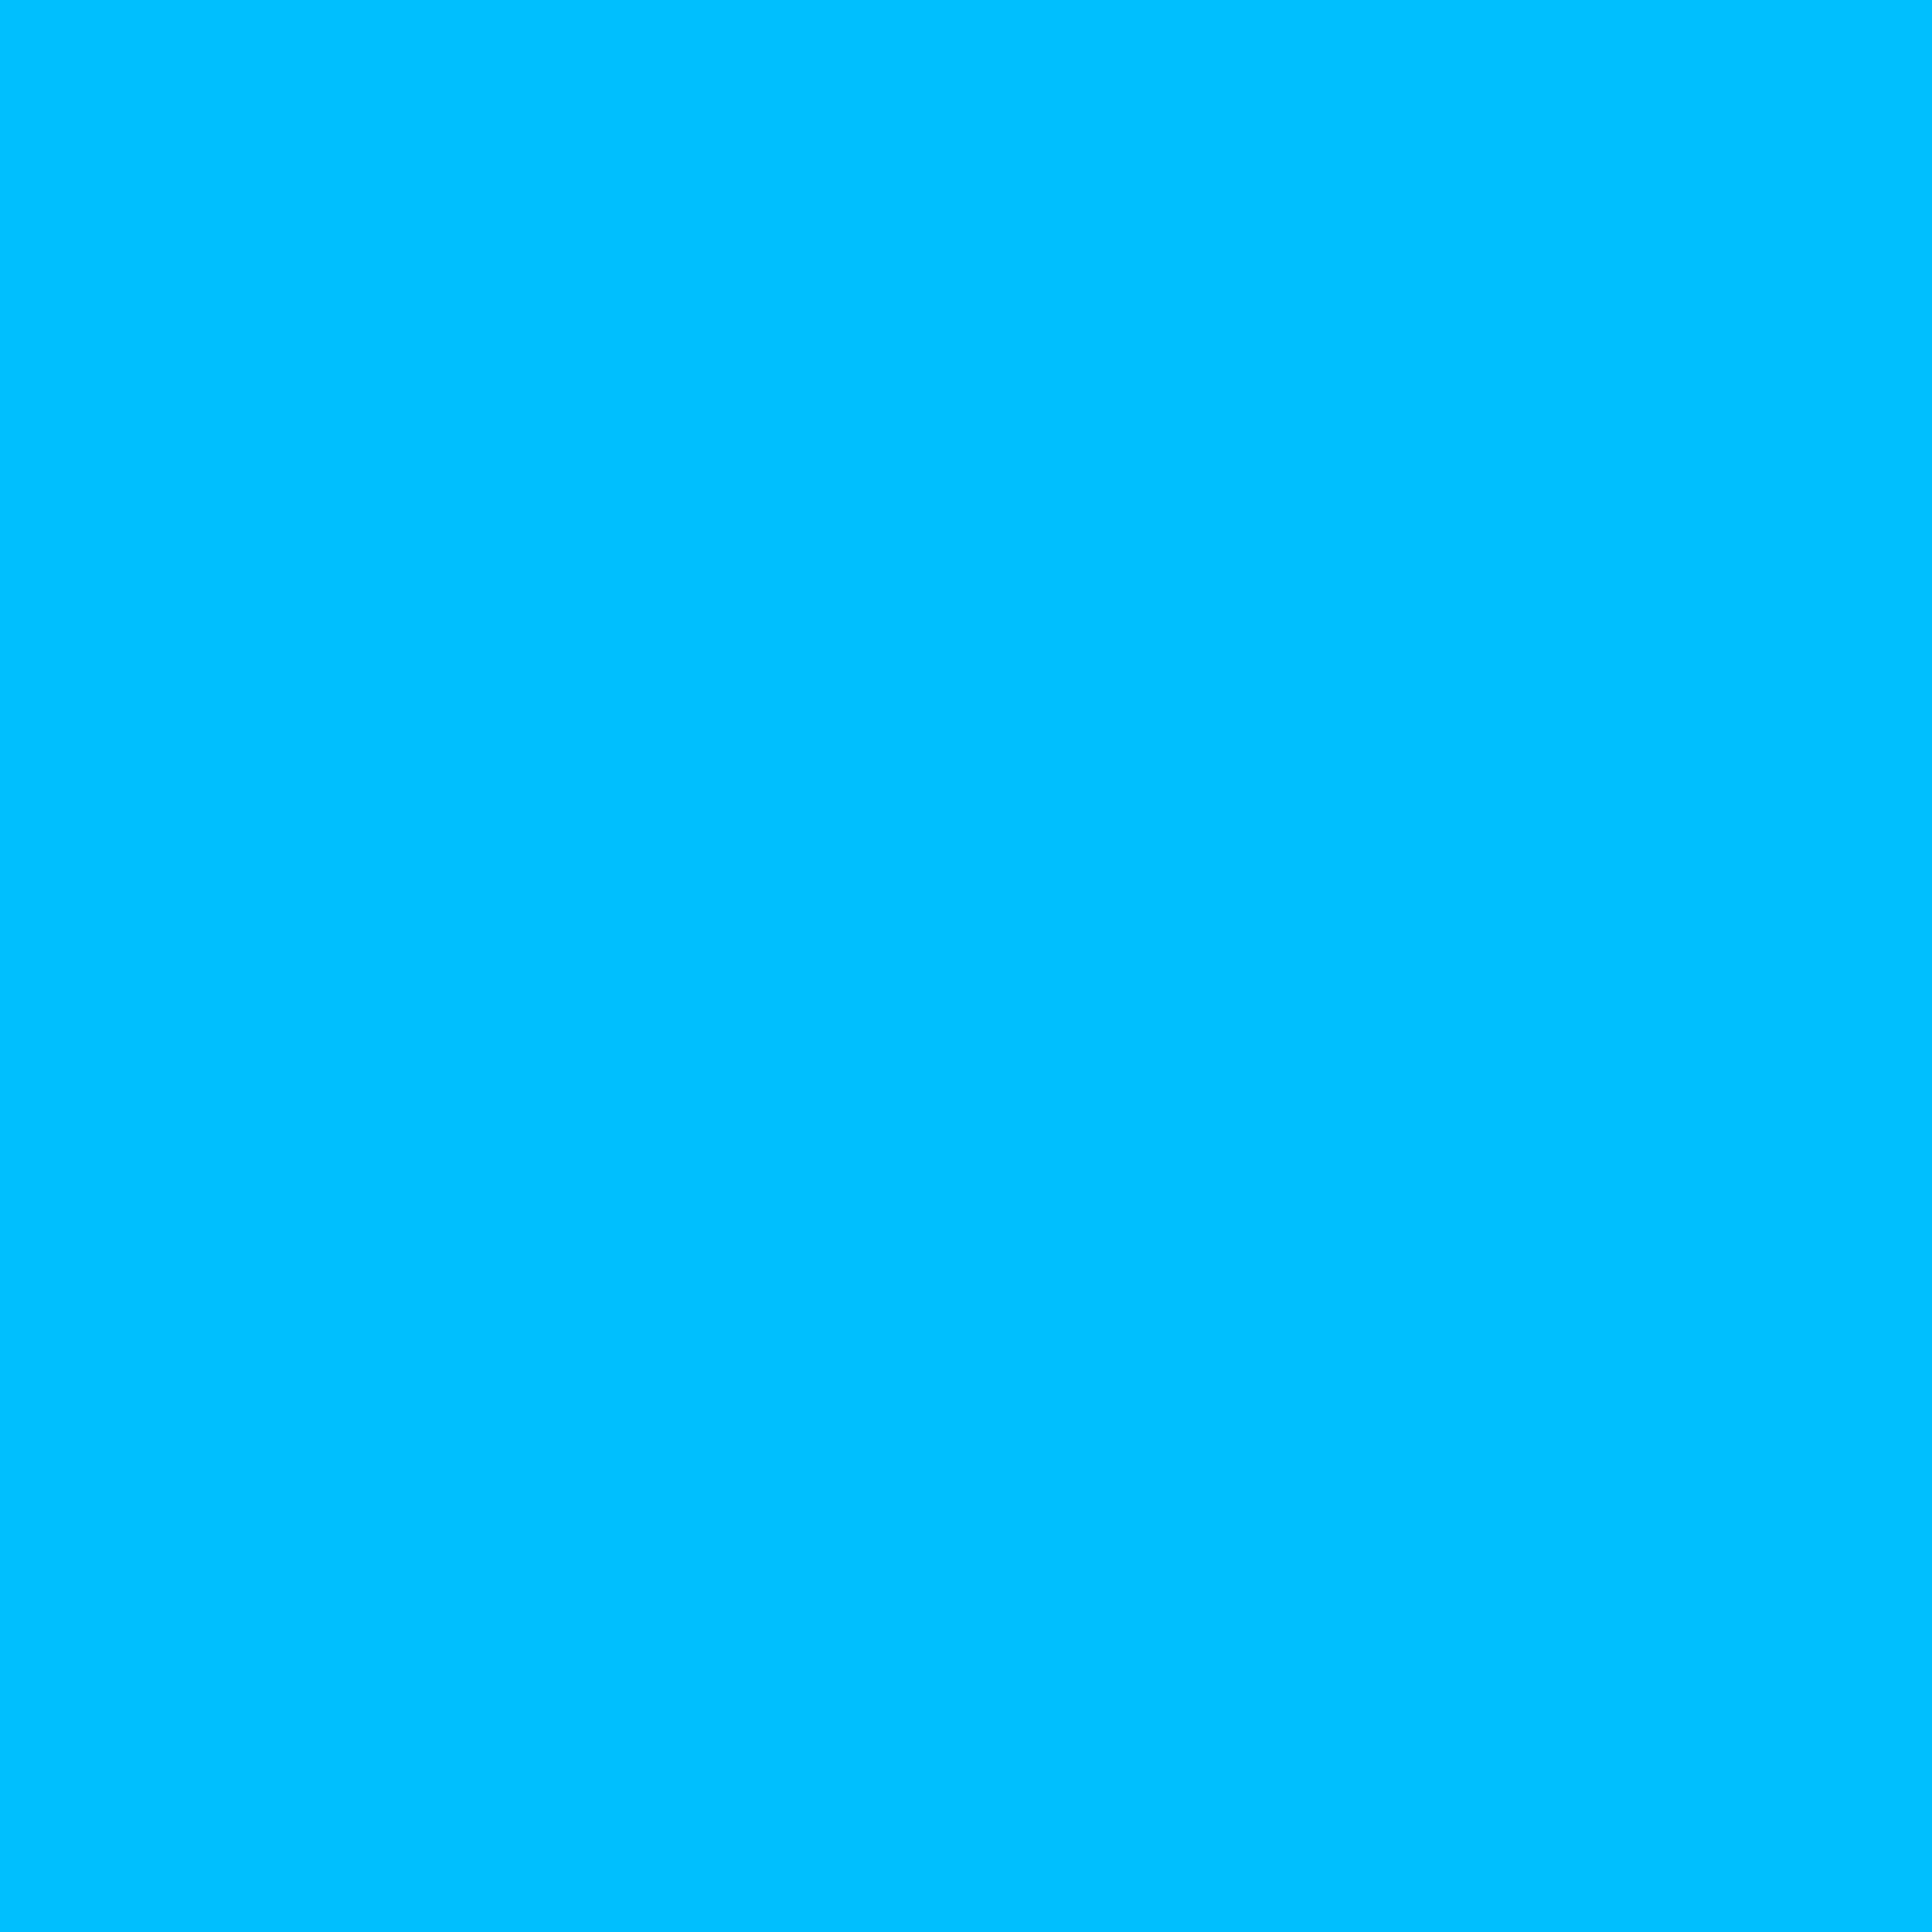 2048x2048 Capri Solid Color Background